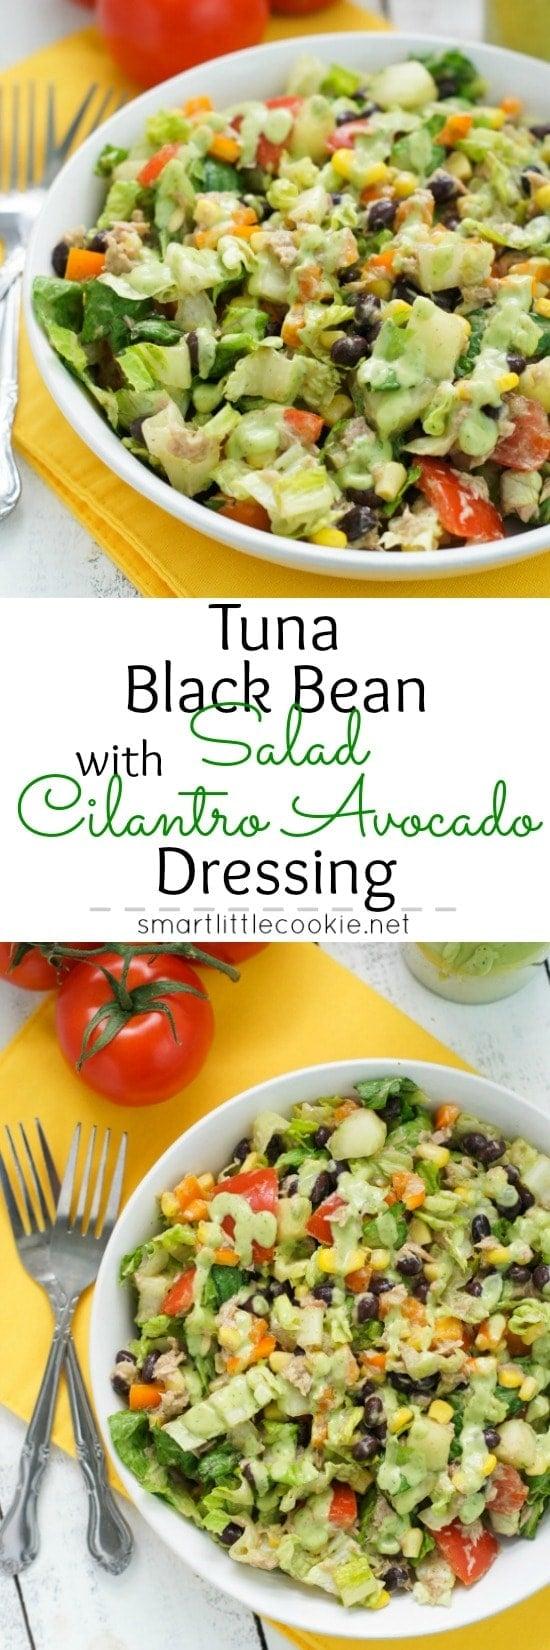 Pinterest graphic. Tuna black bean salad with text overlay.